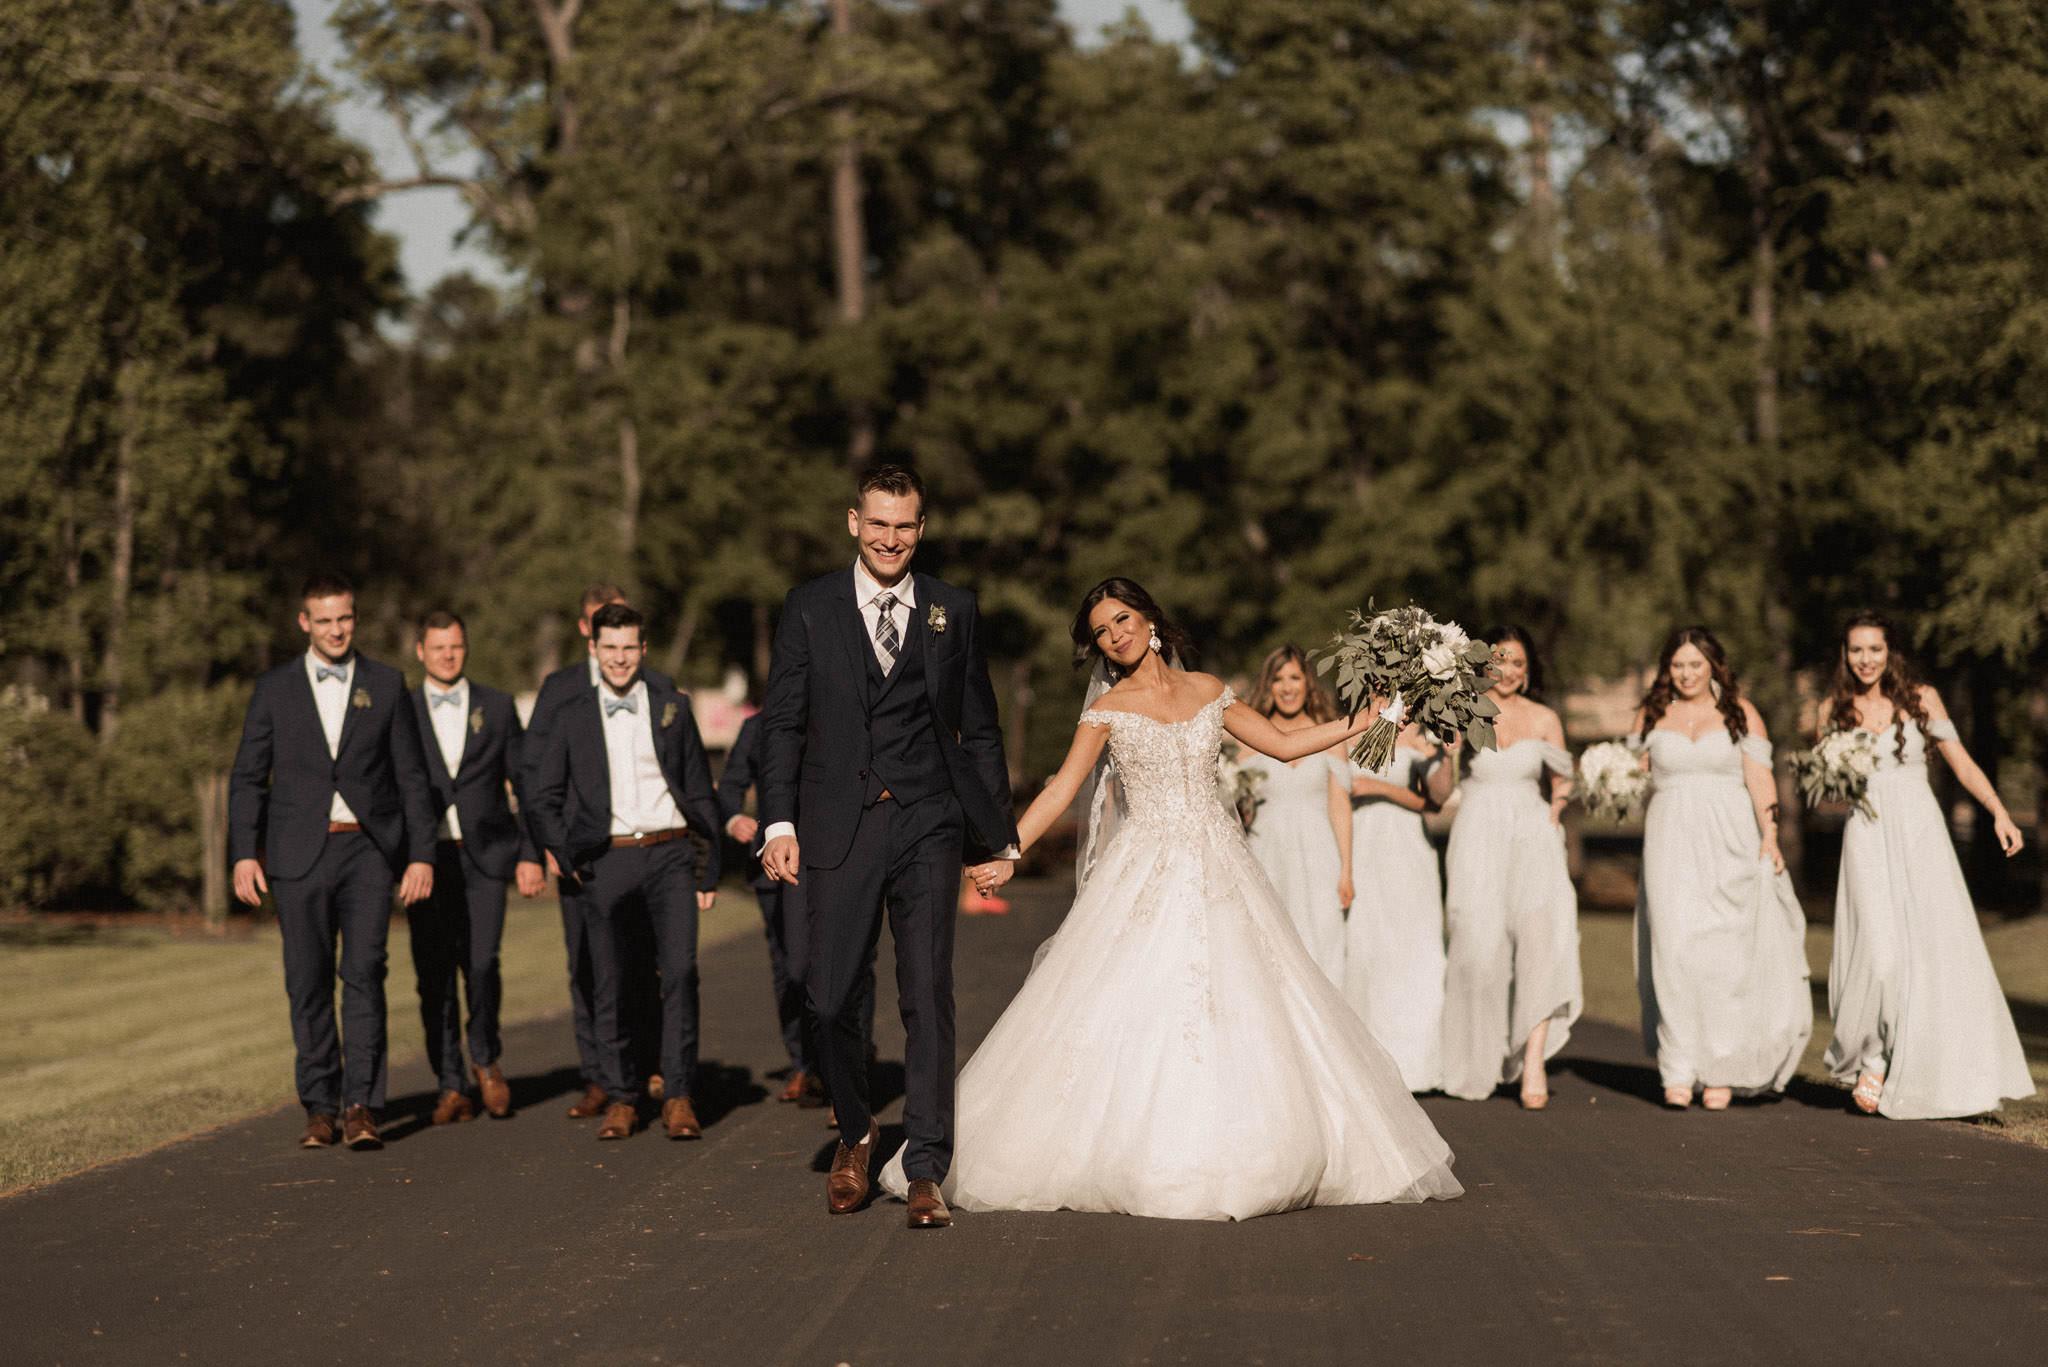 adriana-christian-wedding-re-sm-94.jpg